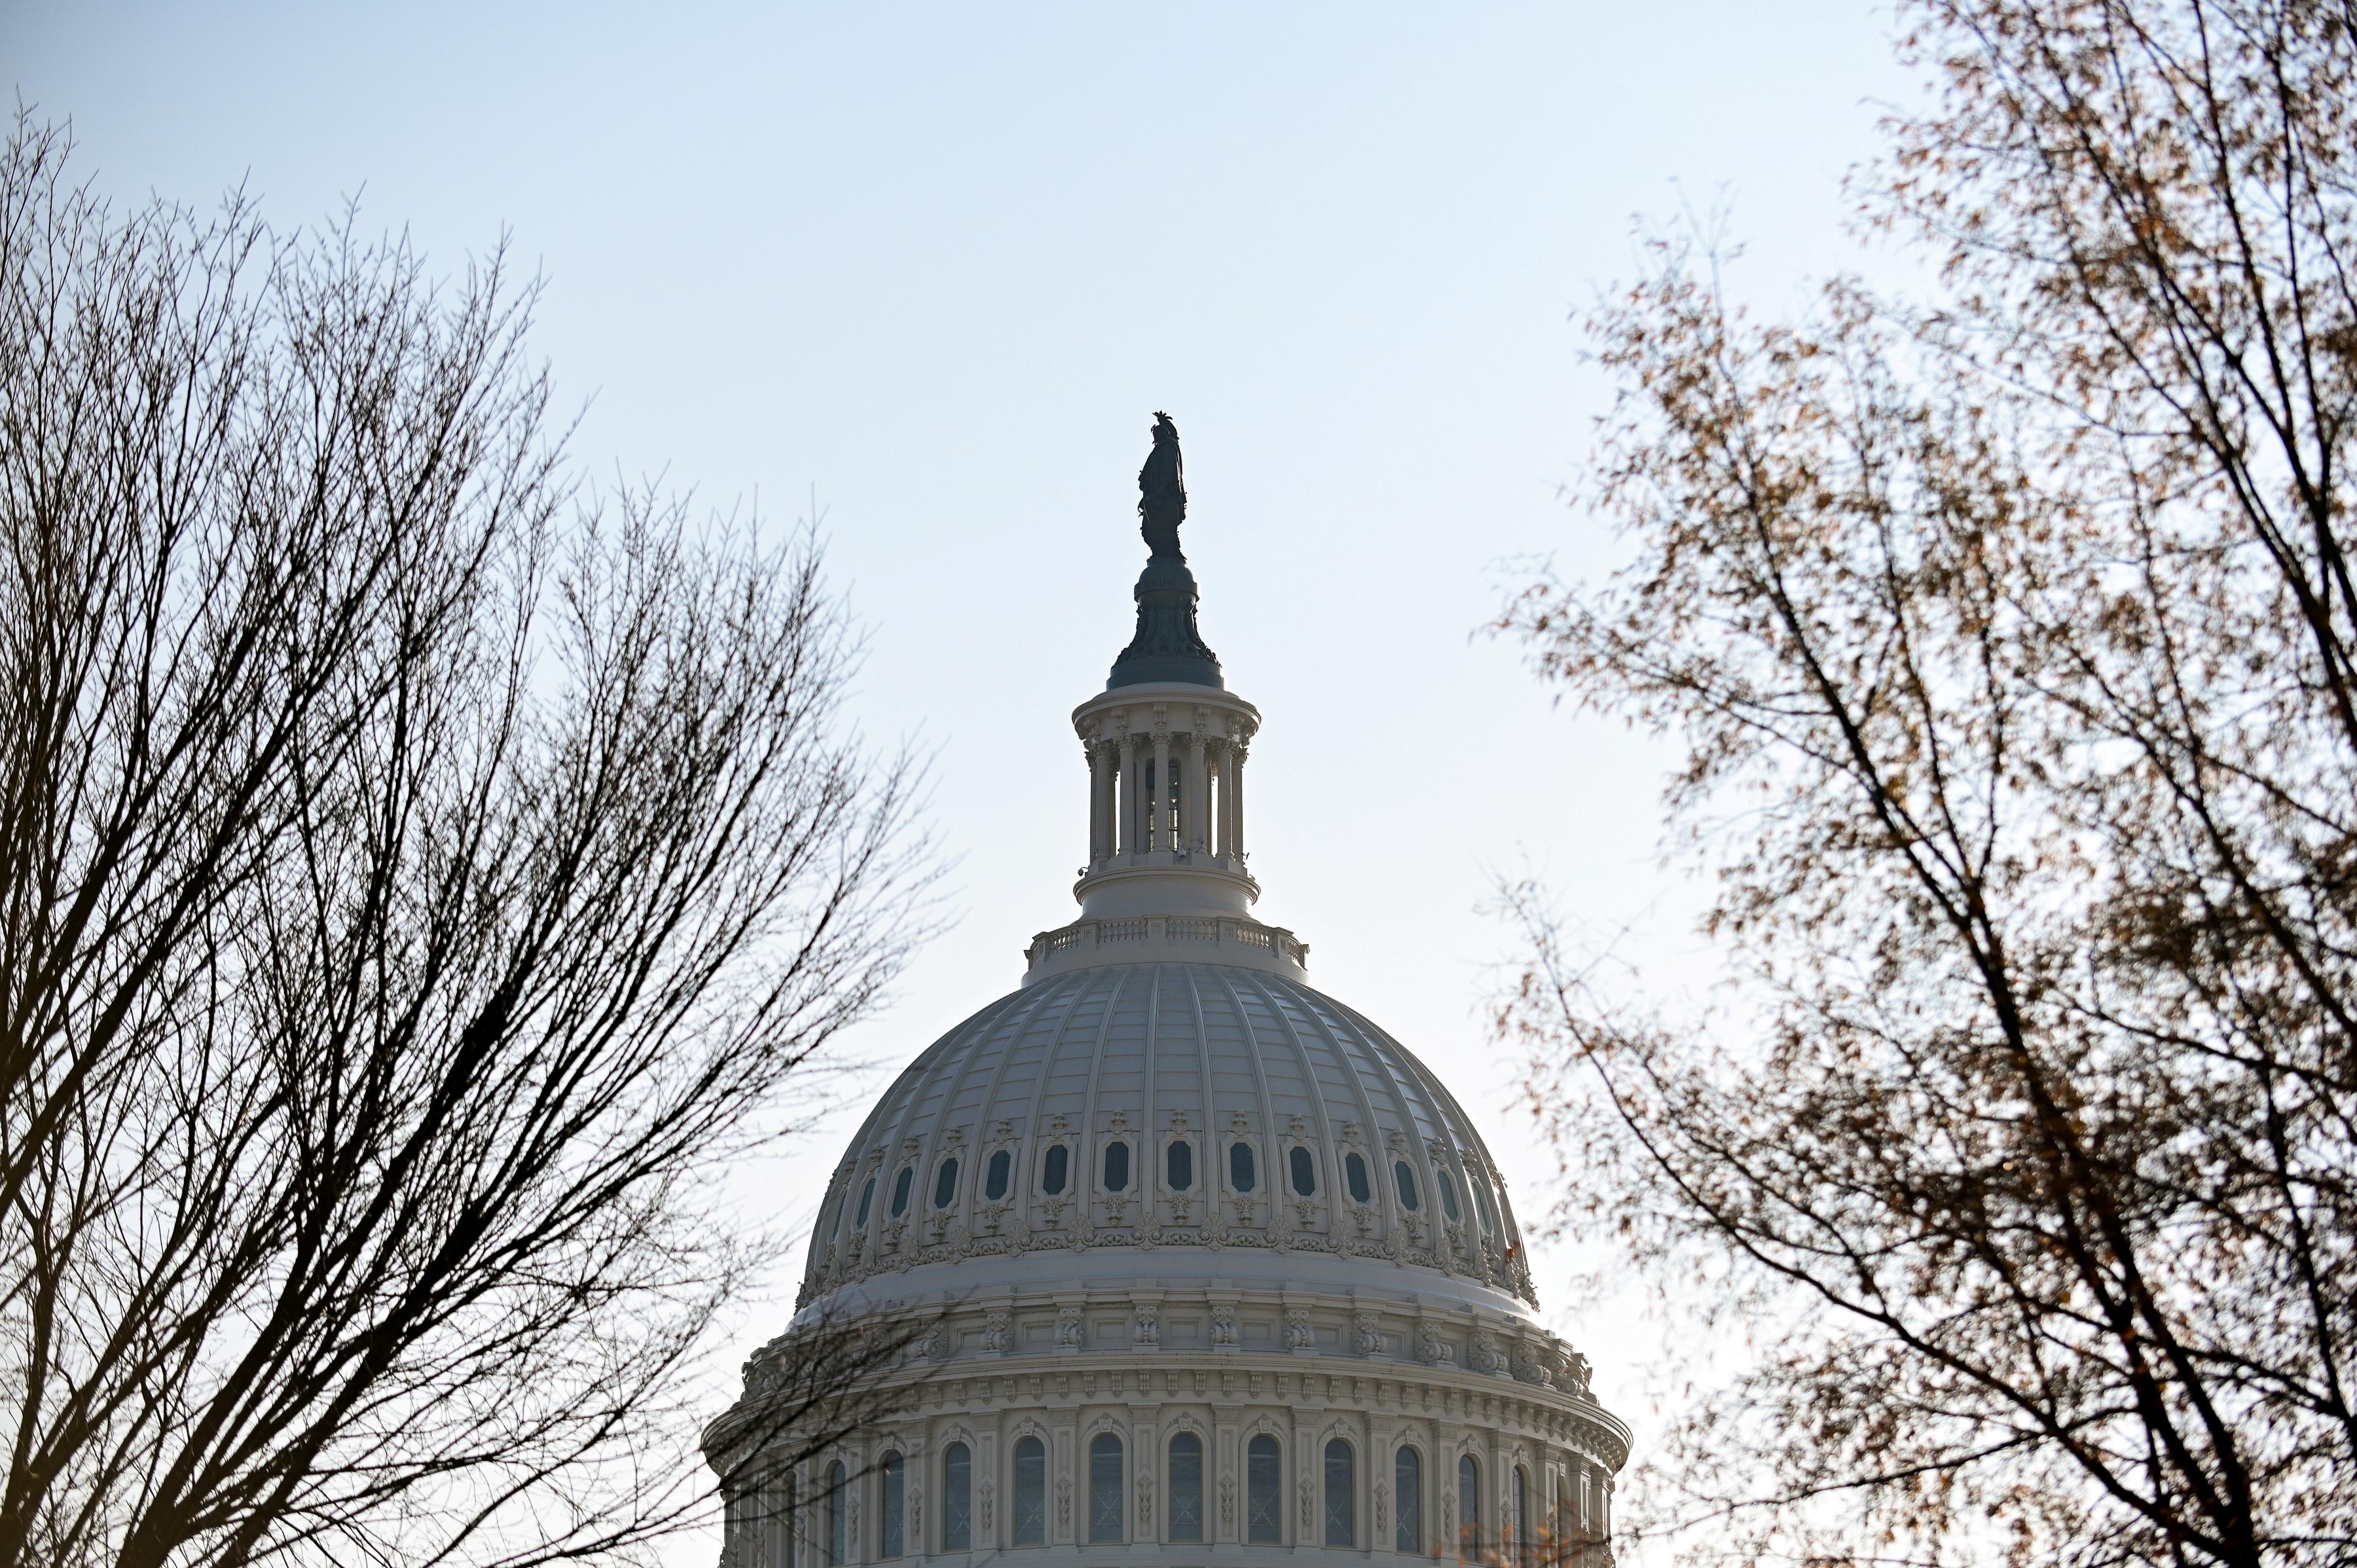 The U.S. Capitol dome is seen in Washington, U.S., December 10, 2020. REUTERS/Erin Scott/File Photo